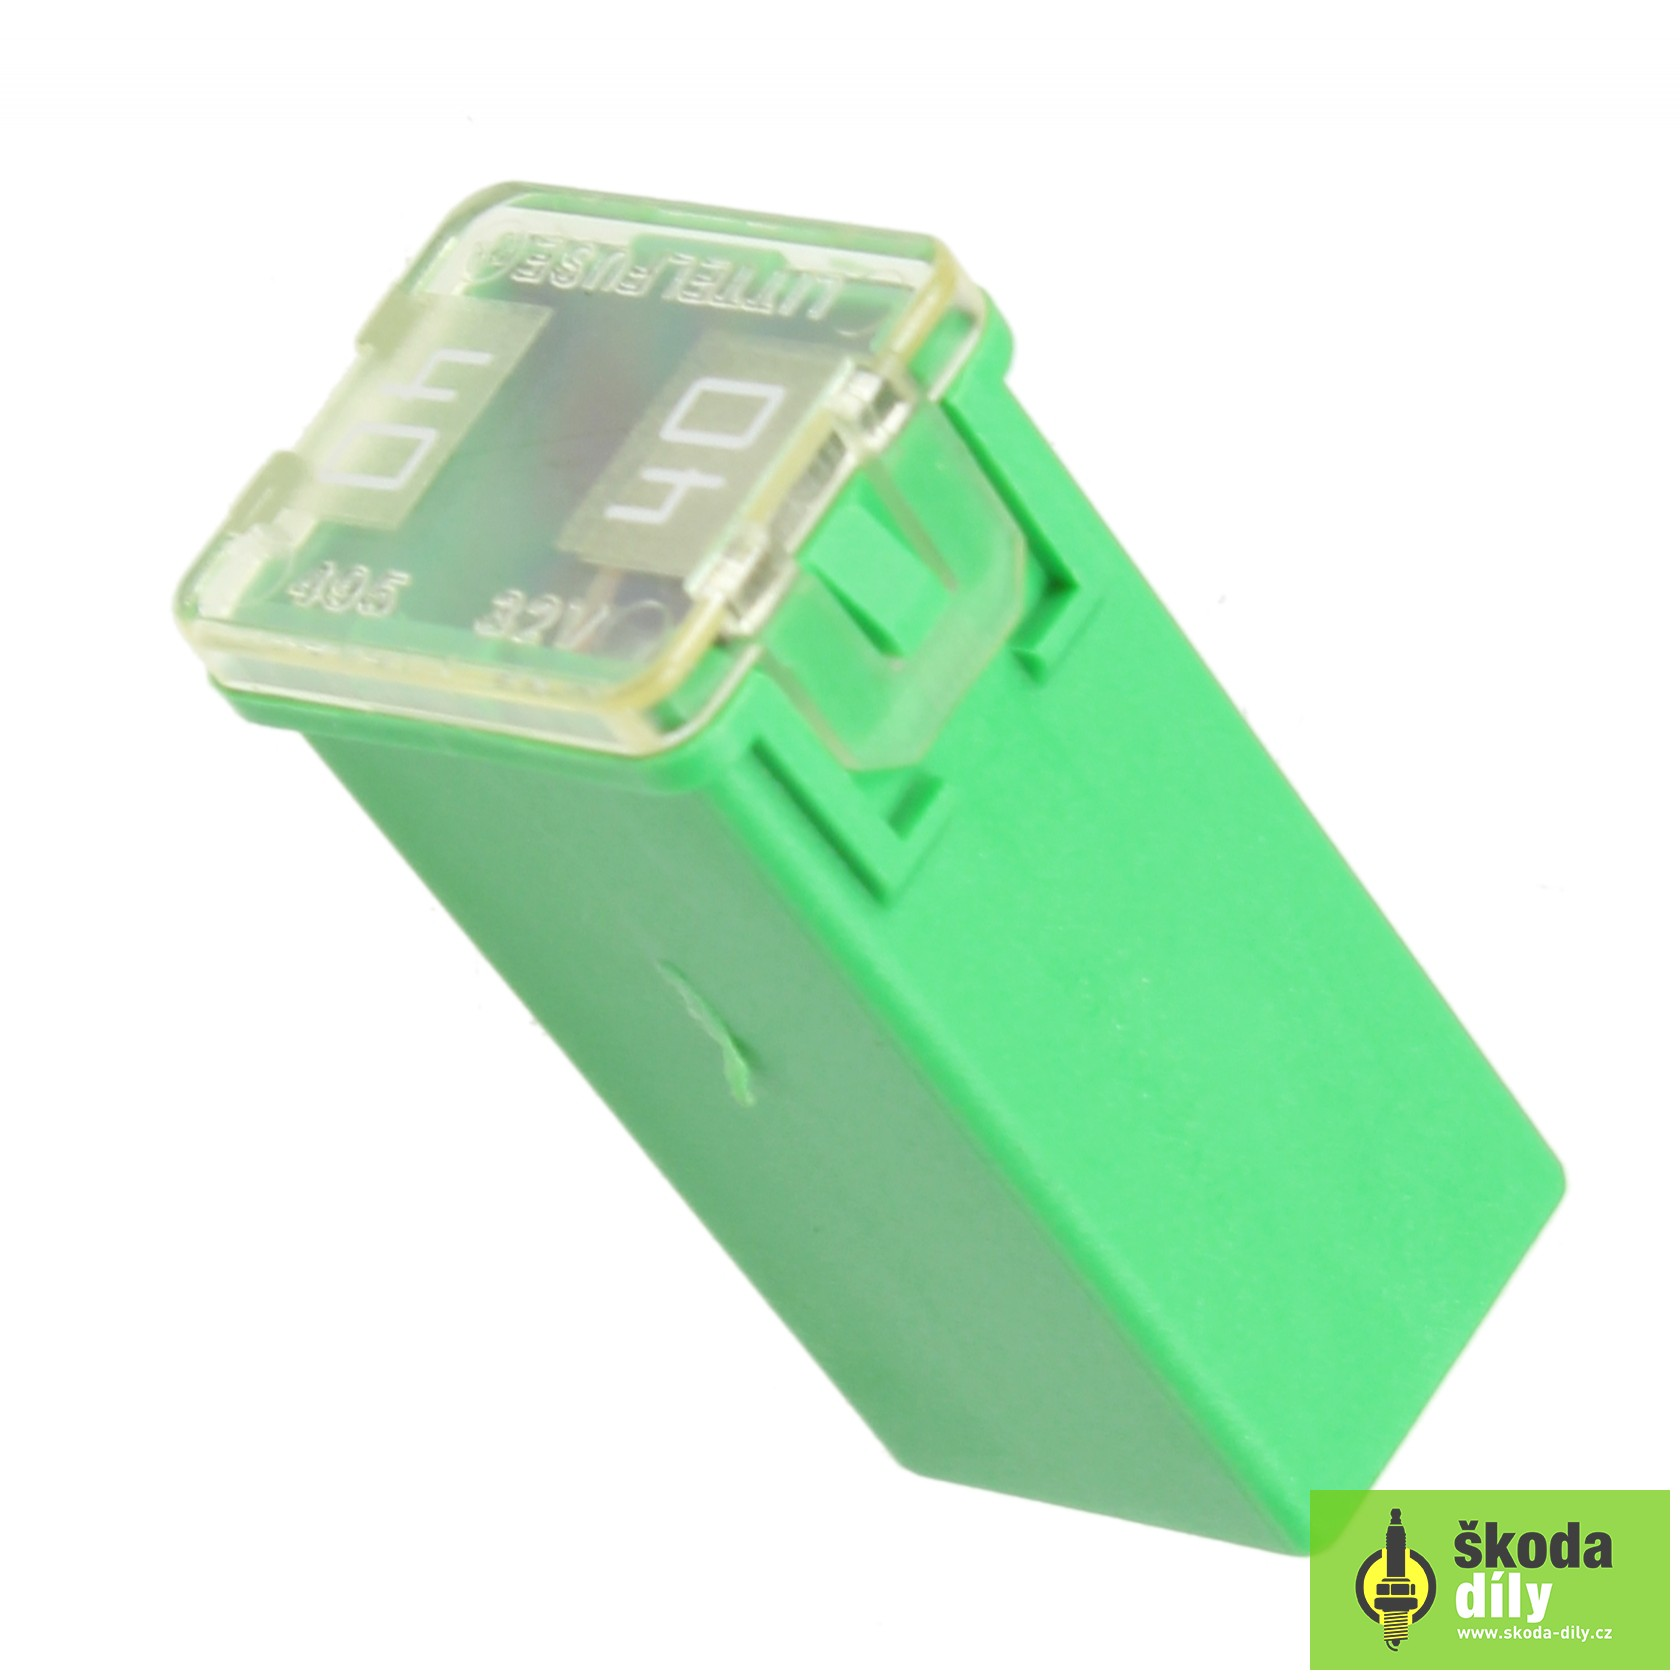 Plug In Fuse 40a Koda N91186304 Skoda Citigo Box Tip